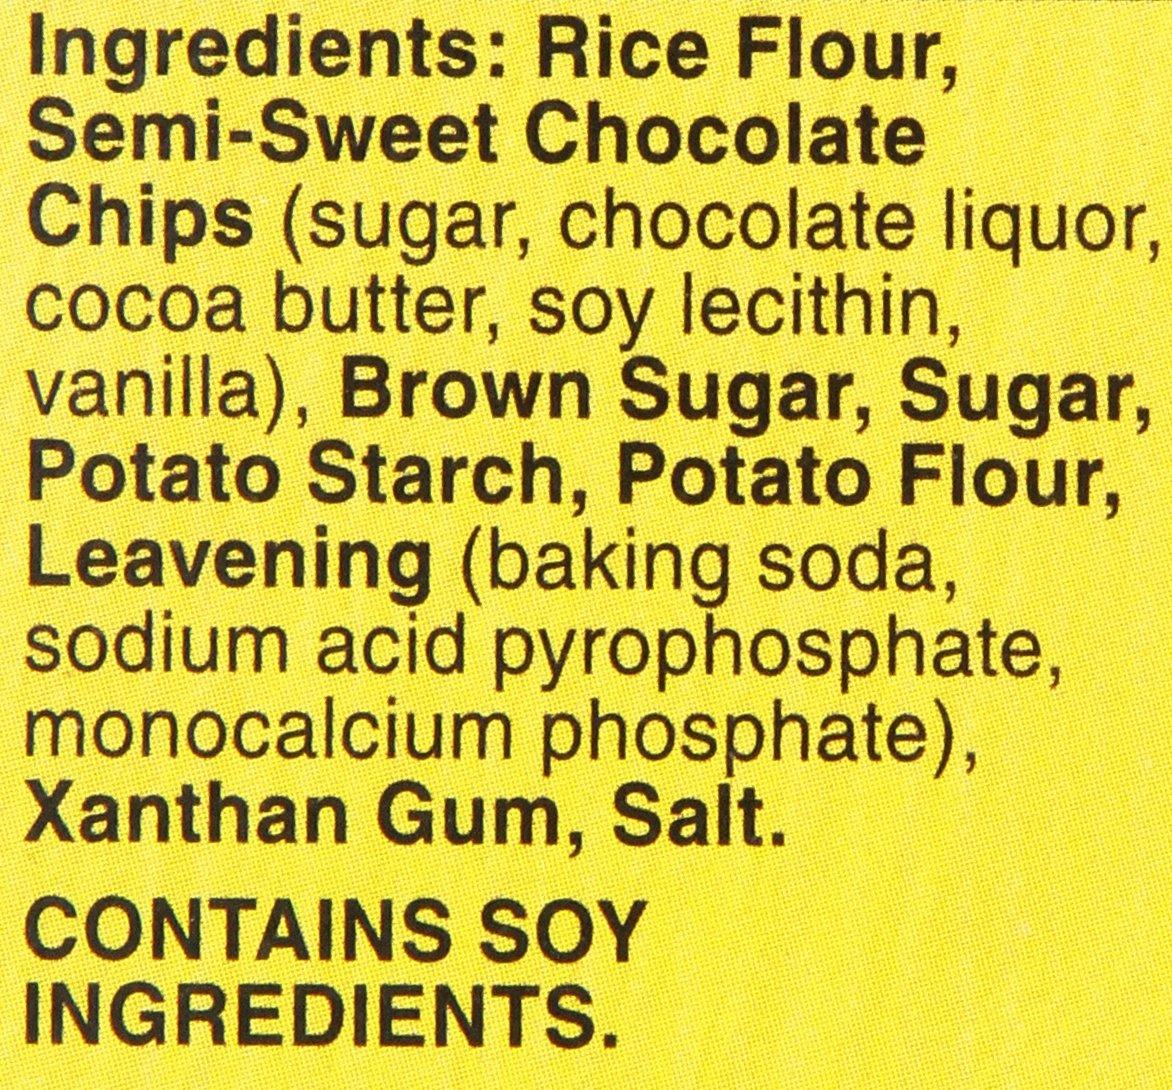 Betty Crocker Baking Mix, Gluten Free Cookie Mix, Chocolate Chip, 19 Oz Box (Pack of 6) by Betty Crocker (Image #4)